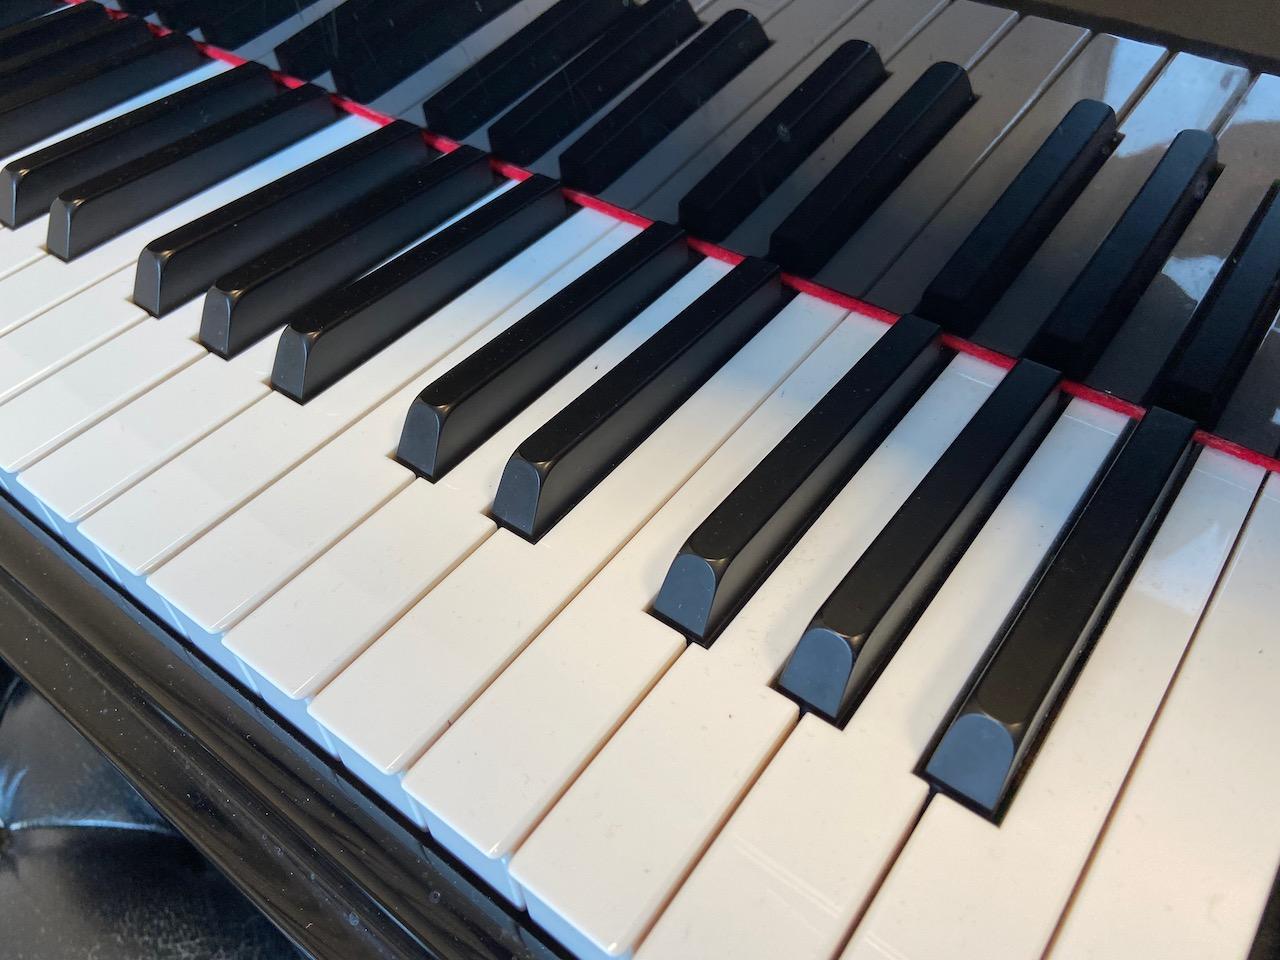 Musikschule ab 7. Dezember 2020